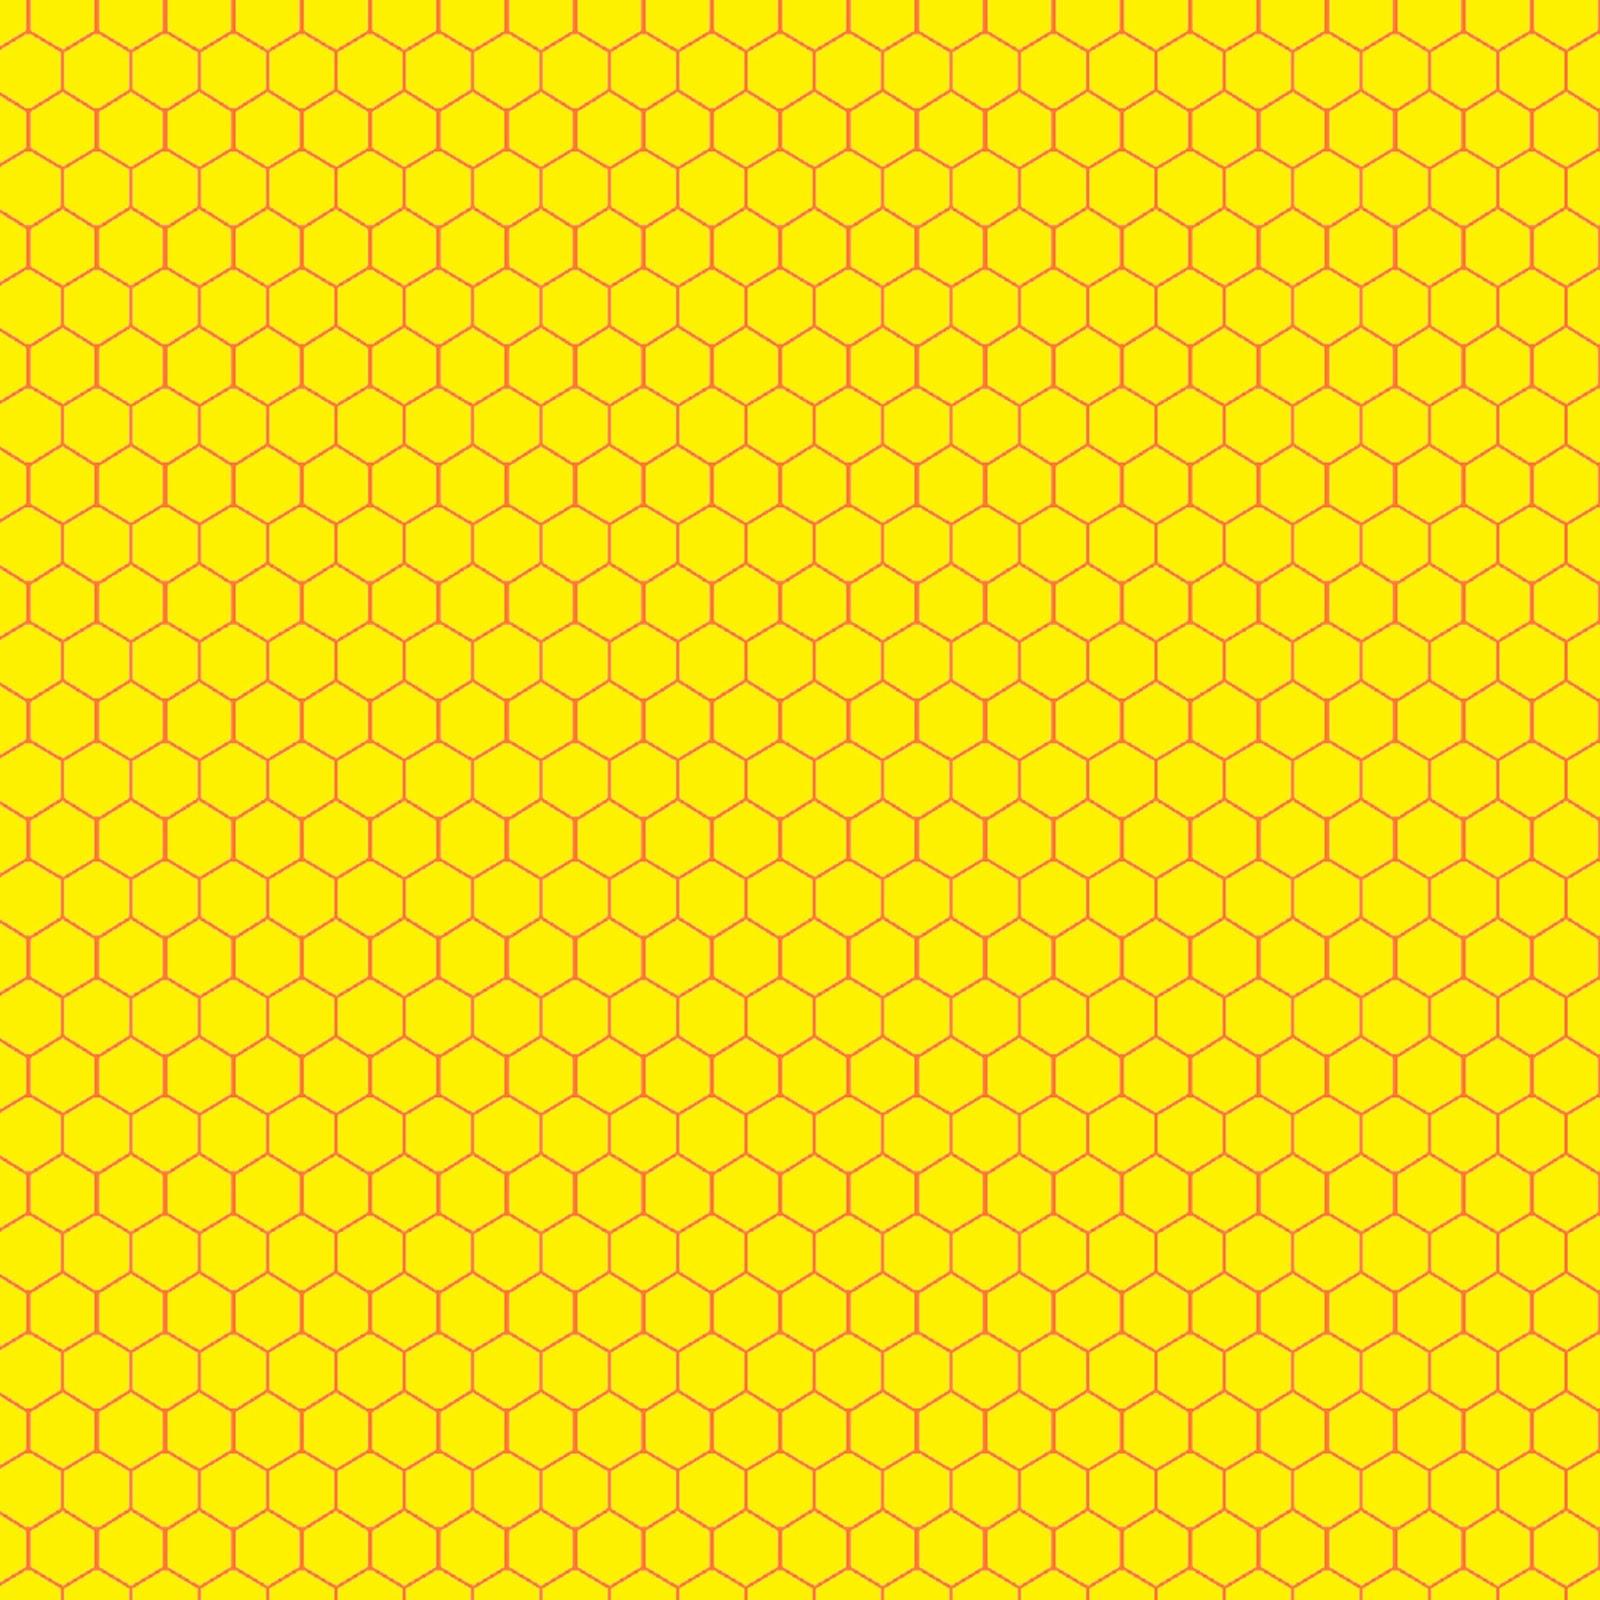 Wallpaper yellow black honeycomb hexagon beehive #000000 # ... |Yellow Honeycomb Wallpaper